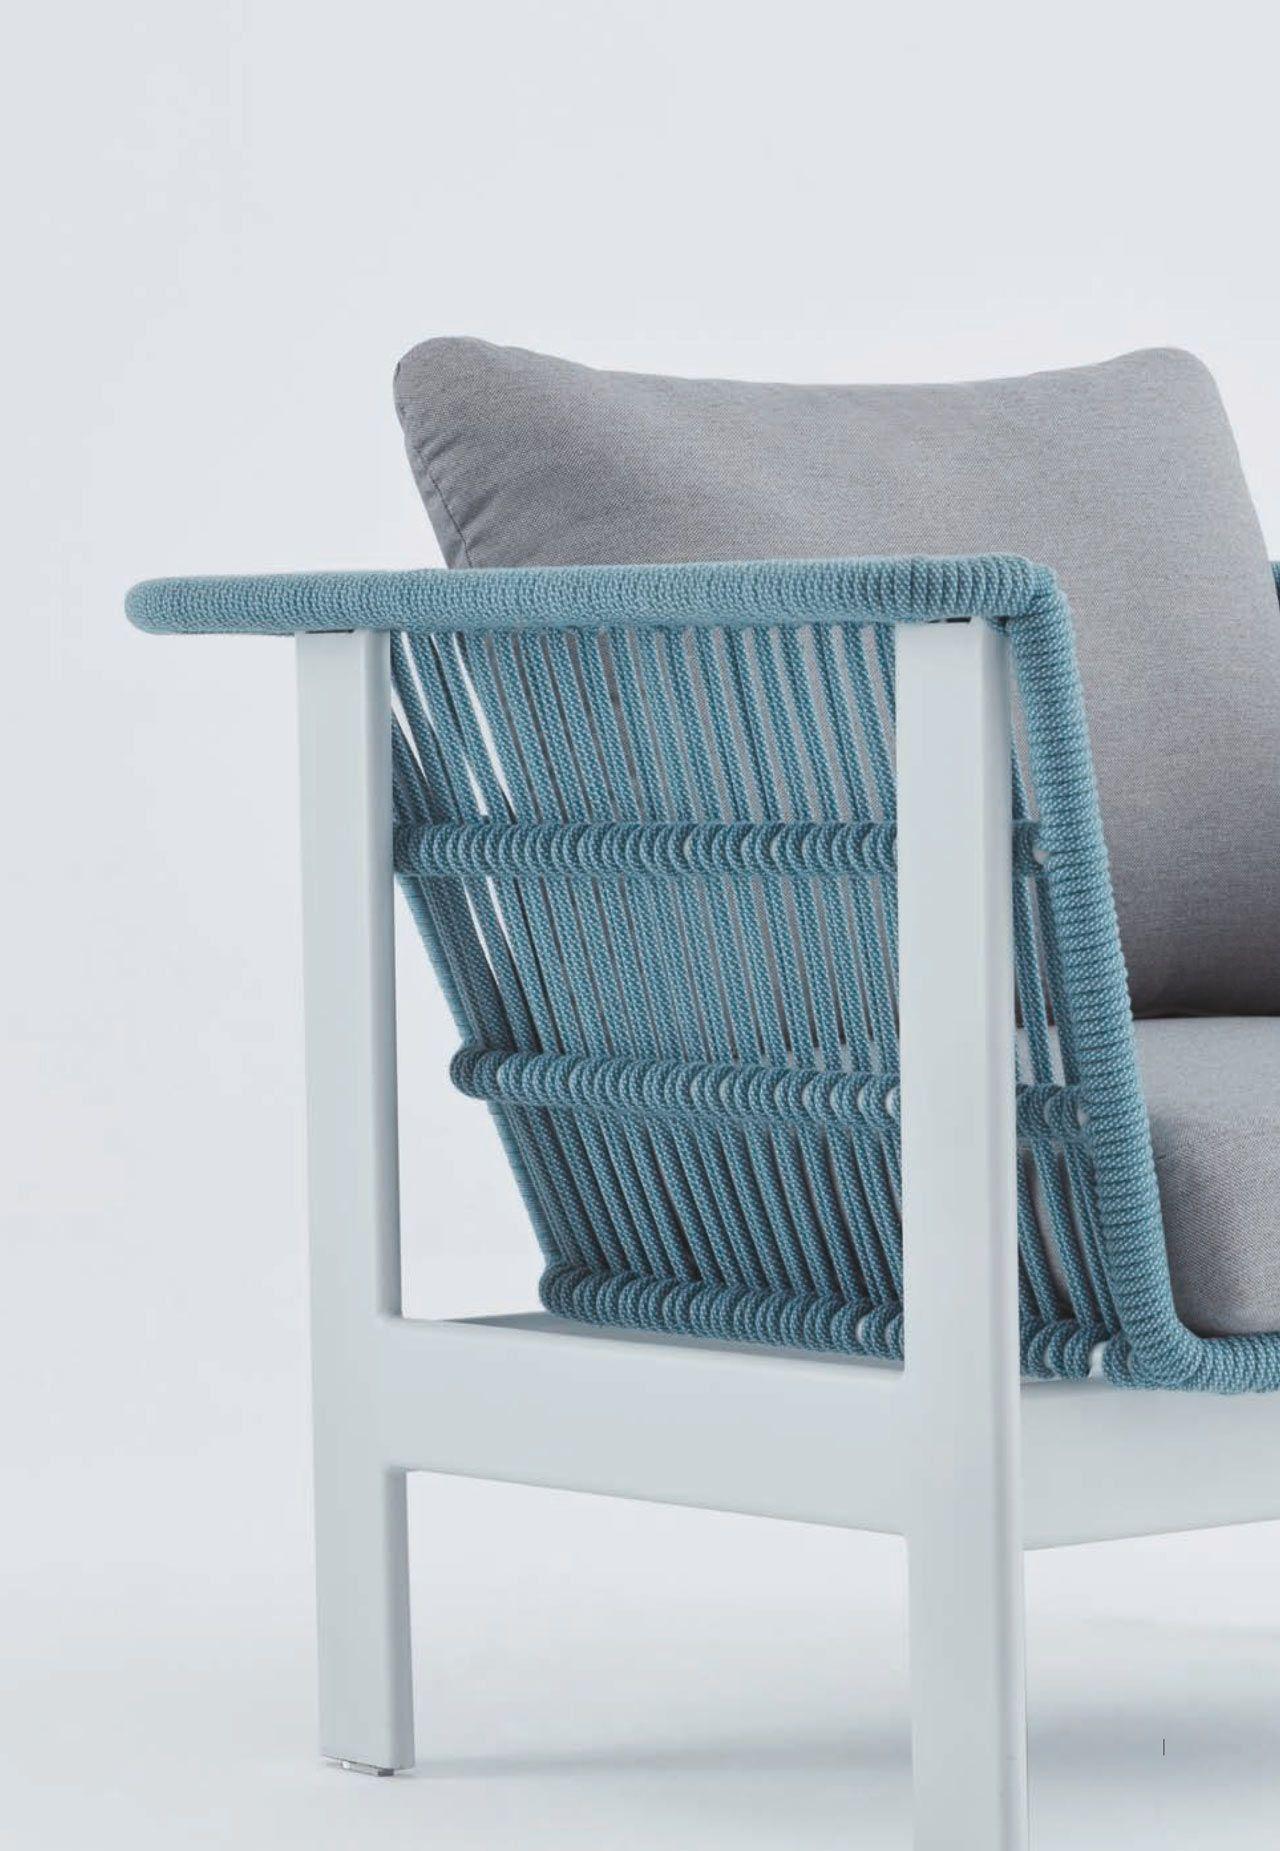 Murcia Outdoor Collection by Muka for Mindo  Aluminium outdoor